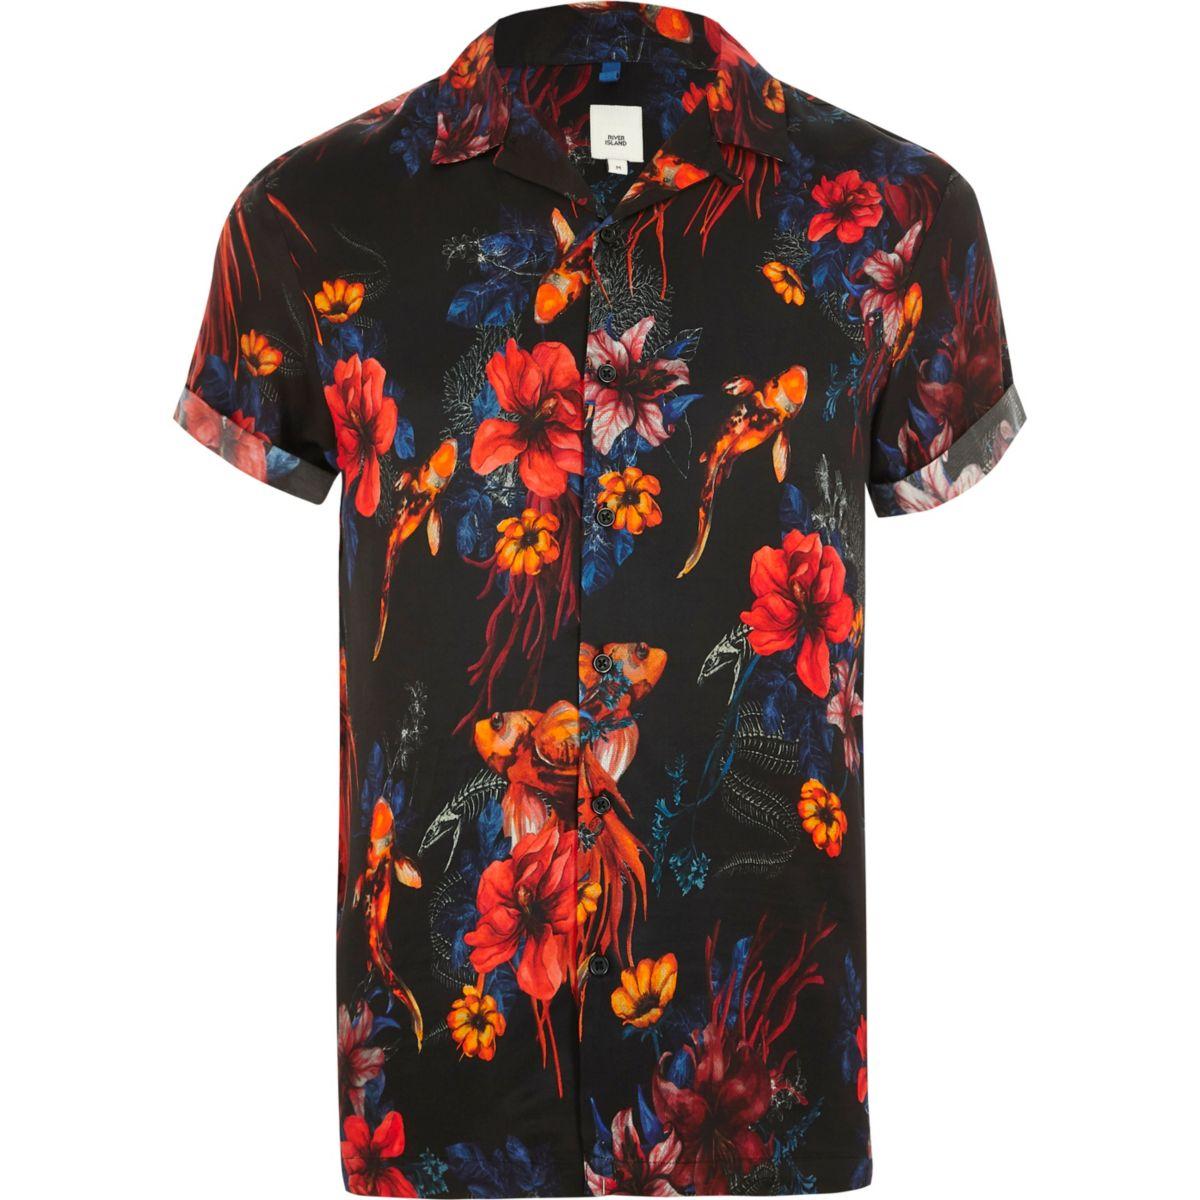 River Island shirt - £28 - Florals x fish - enough said.